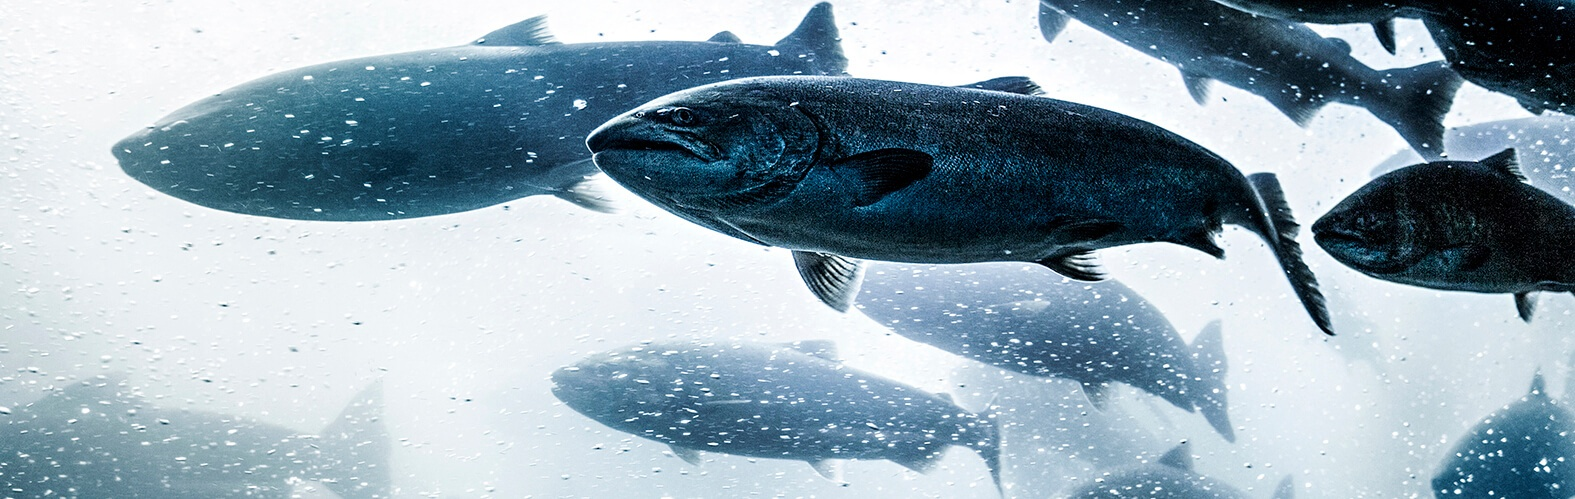 Qrill aqua - krill to ensure fish health.jpg